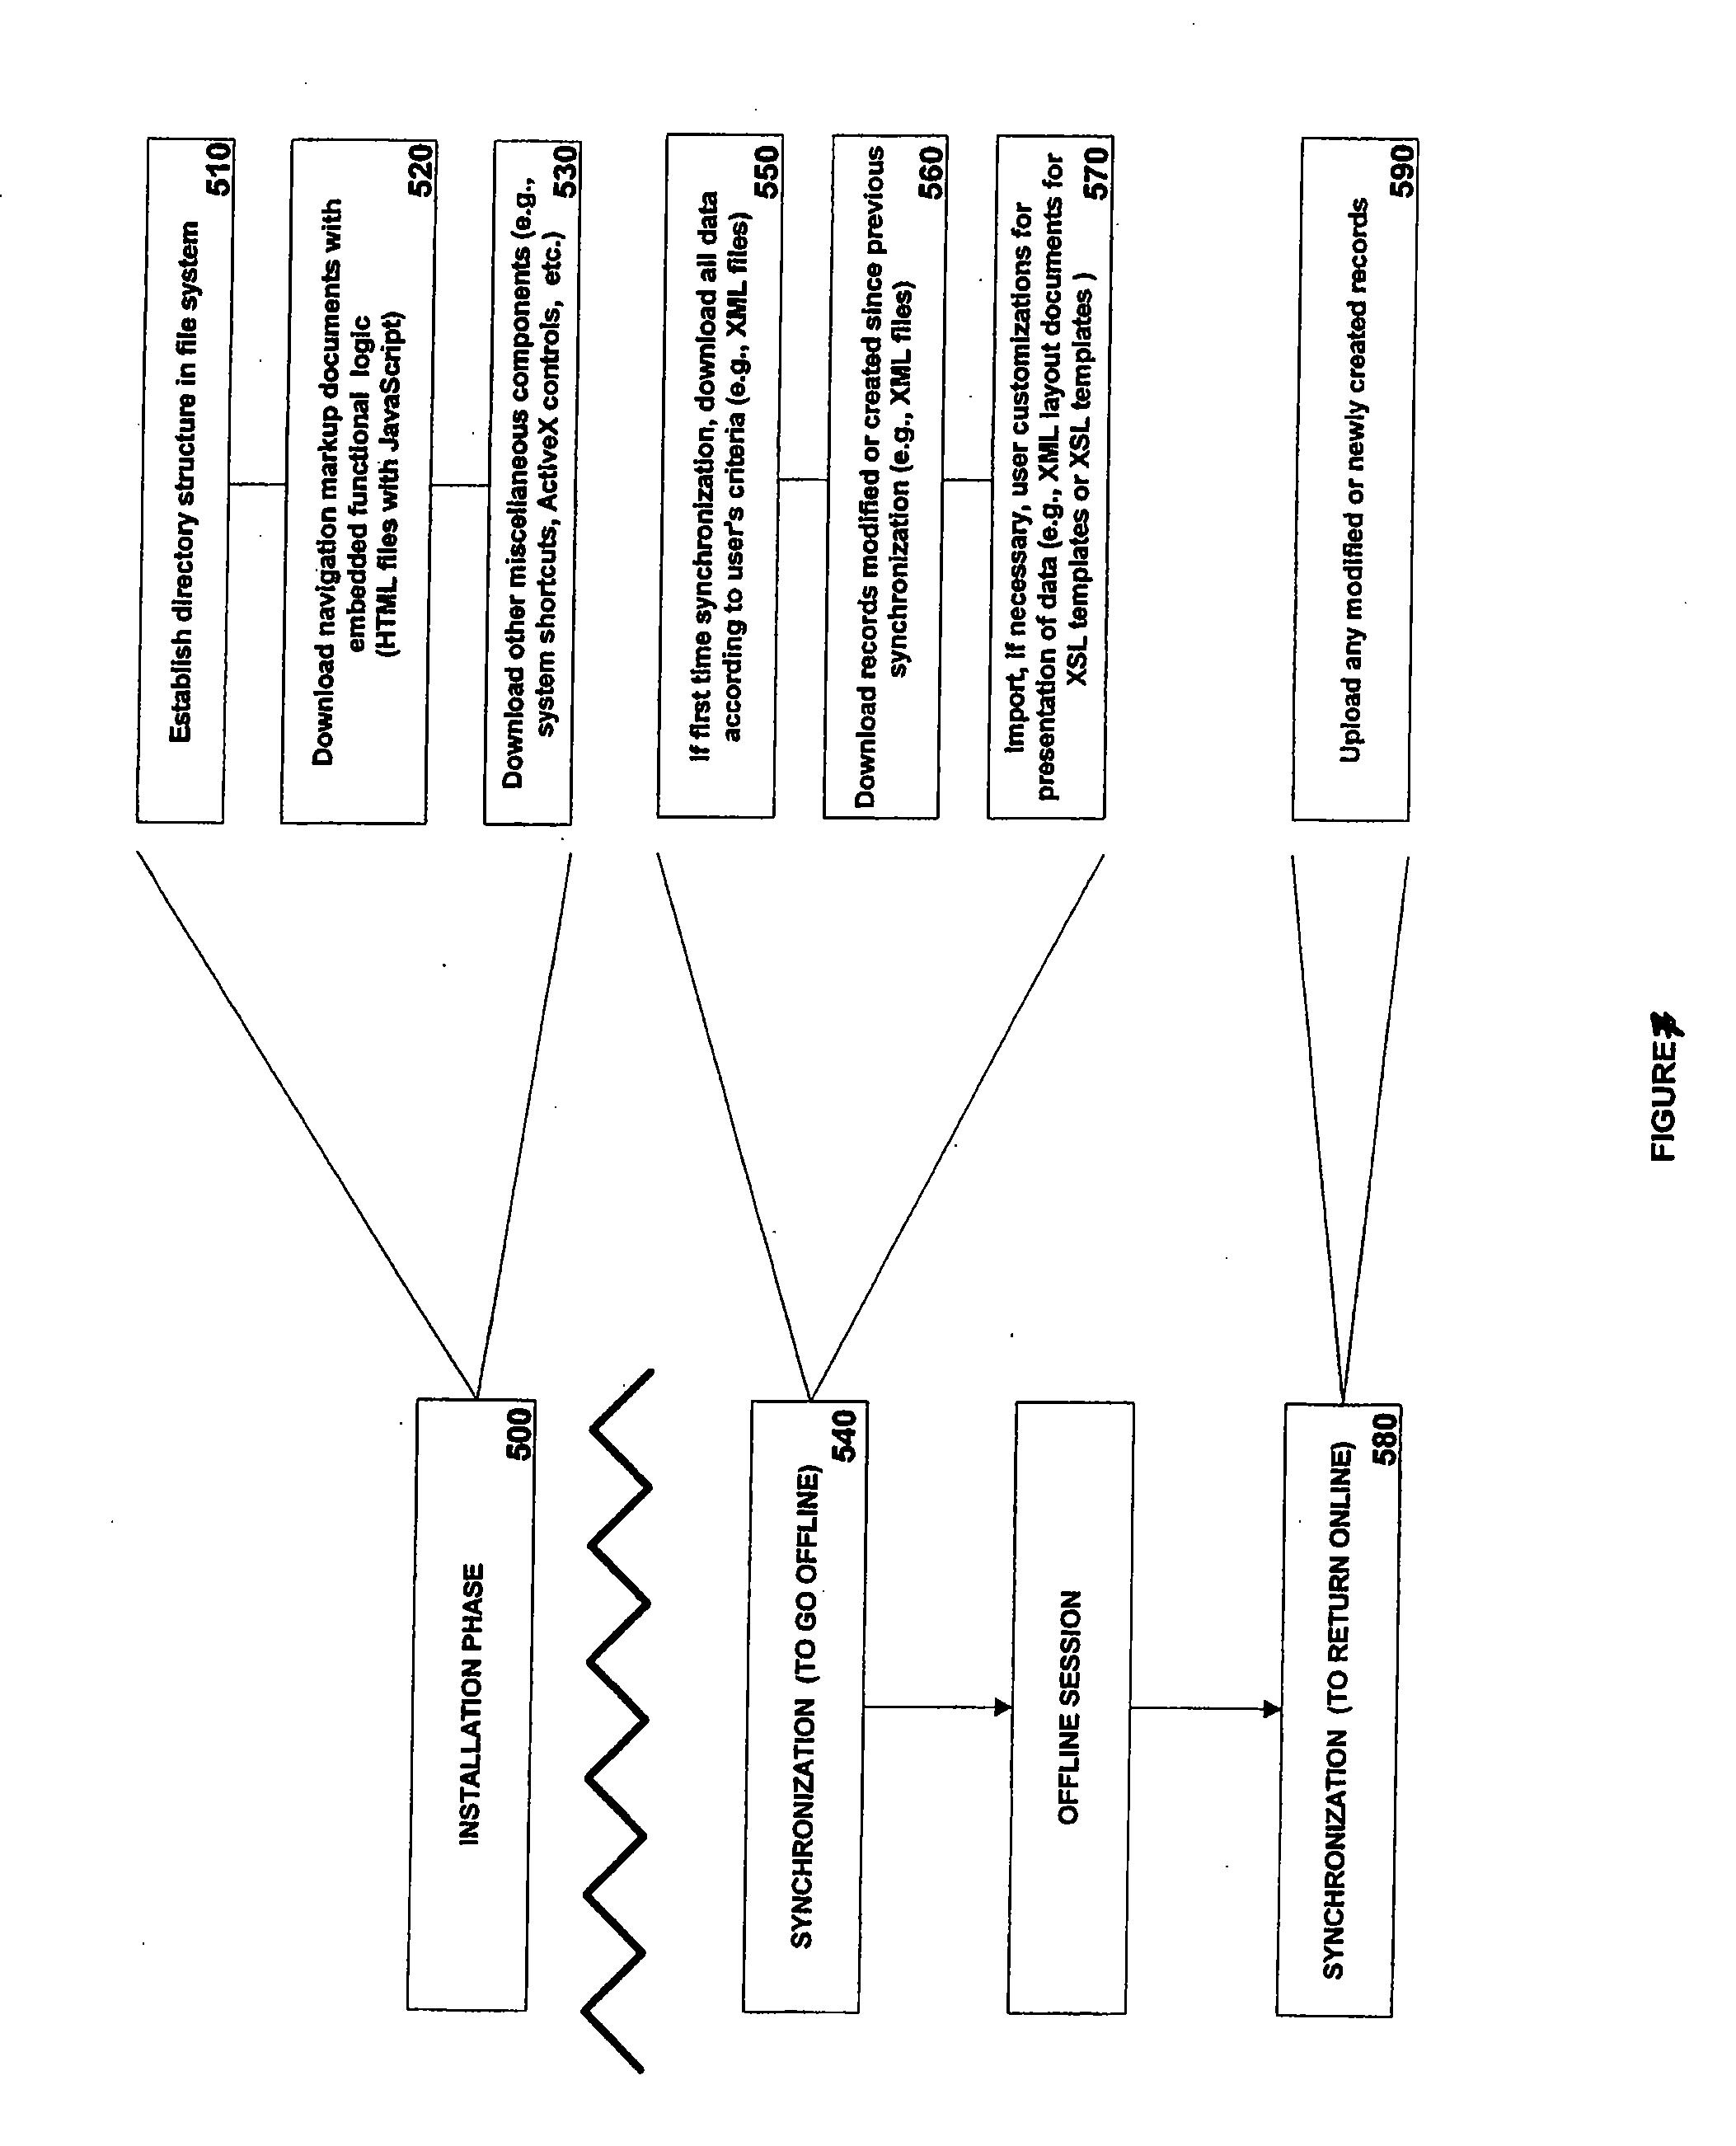 patent us20070078950 offline web services api to mirror online web